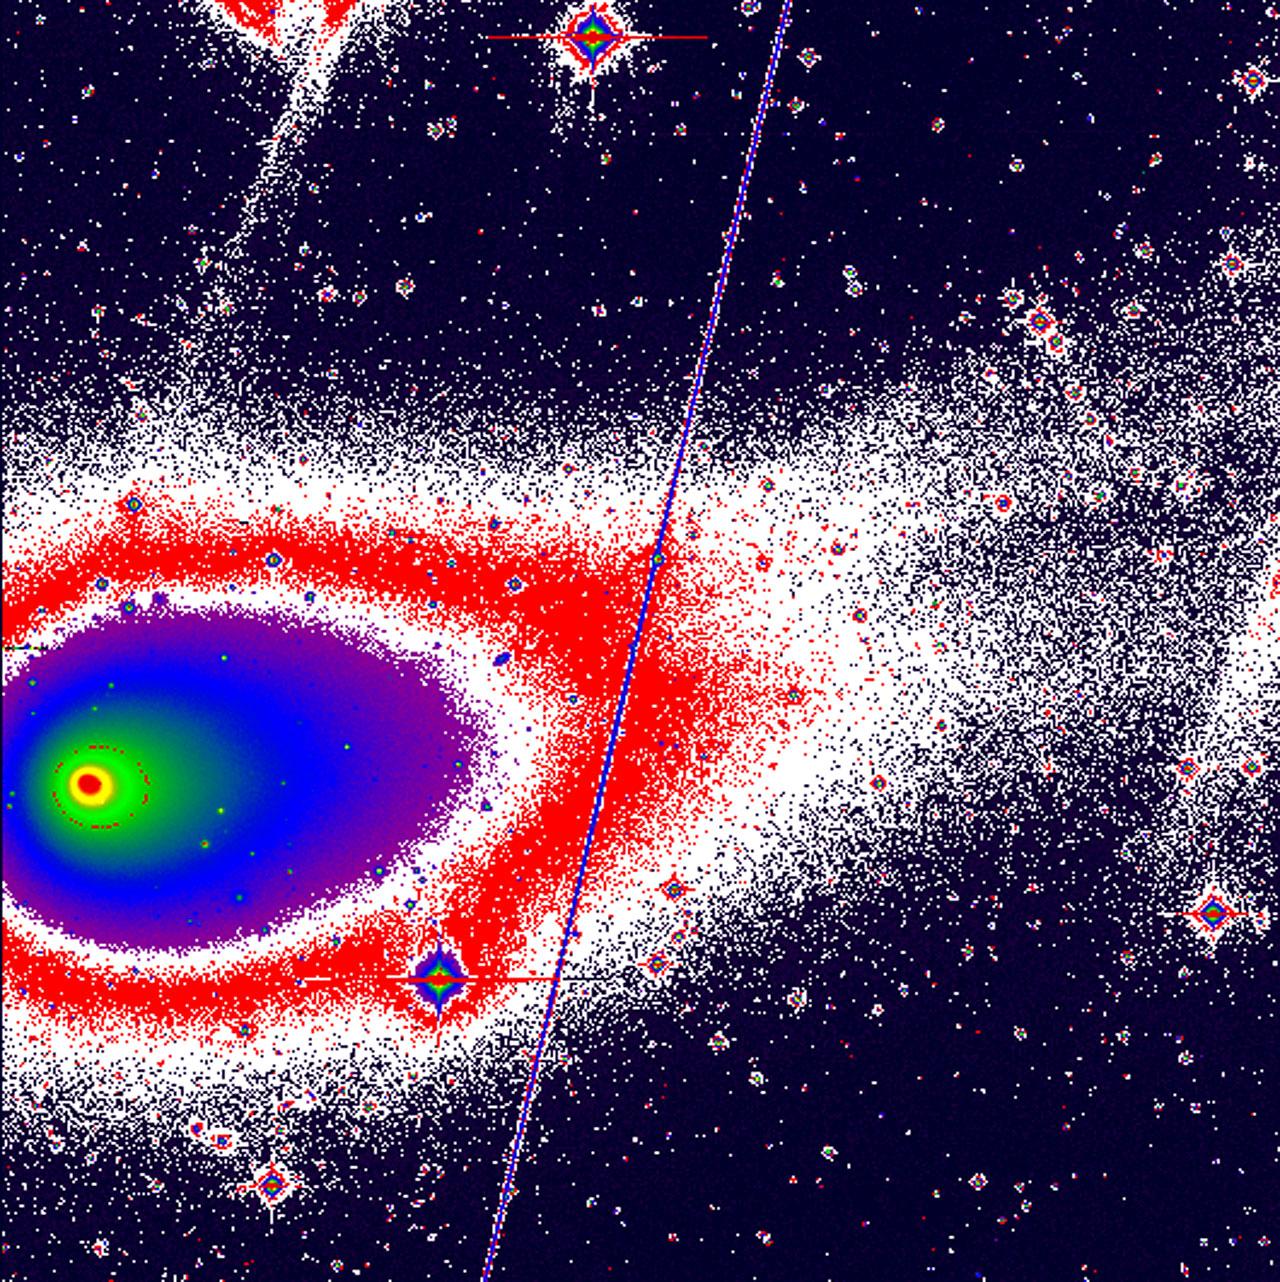 Comet Hyakutake Develops Two Tails